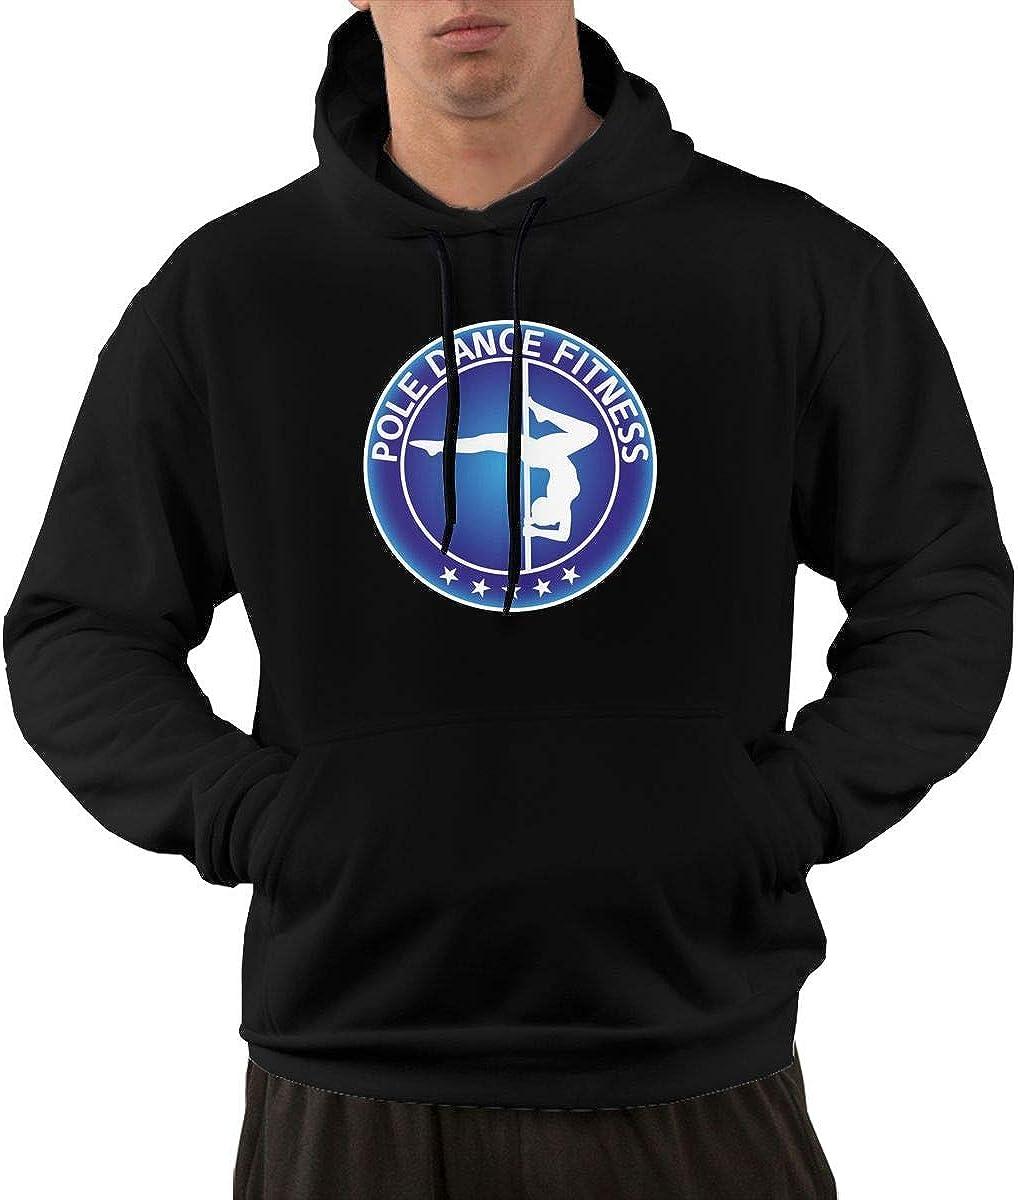 Gjdv Pole Dance Fitness Mens Front Pocket Pullover Cotton Hoodie Sweatshirts